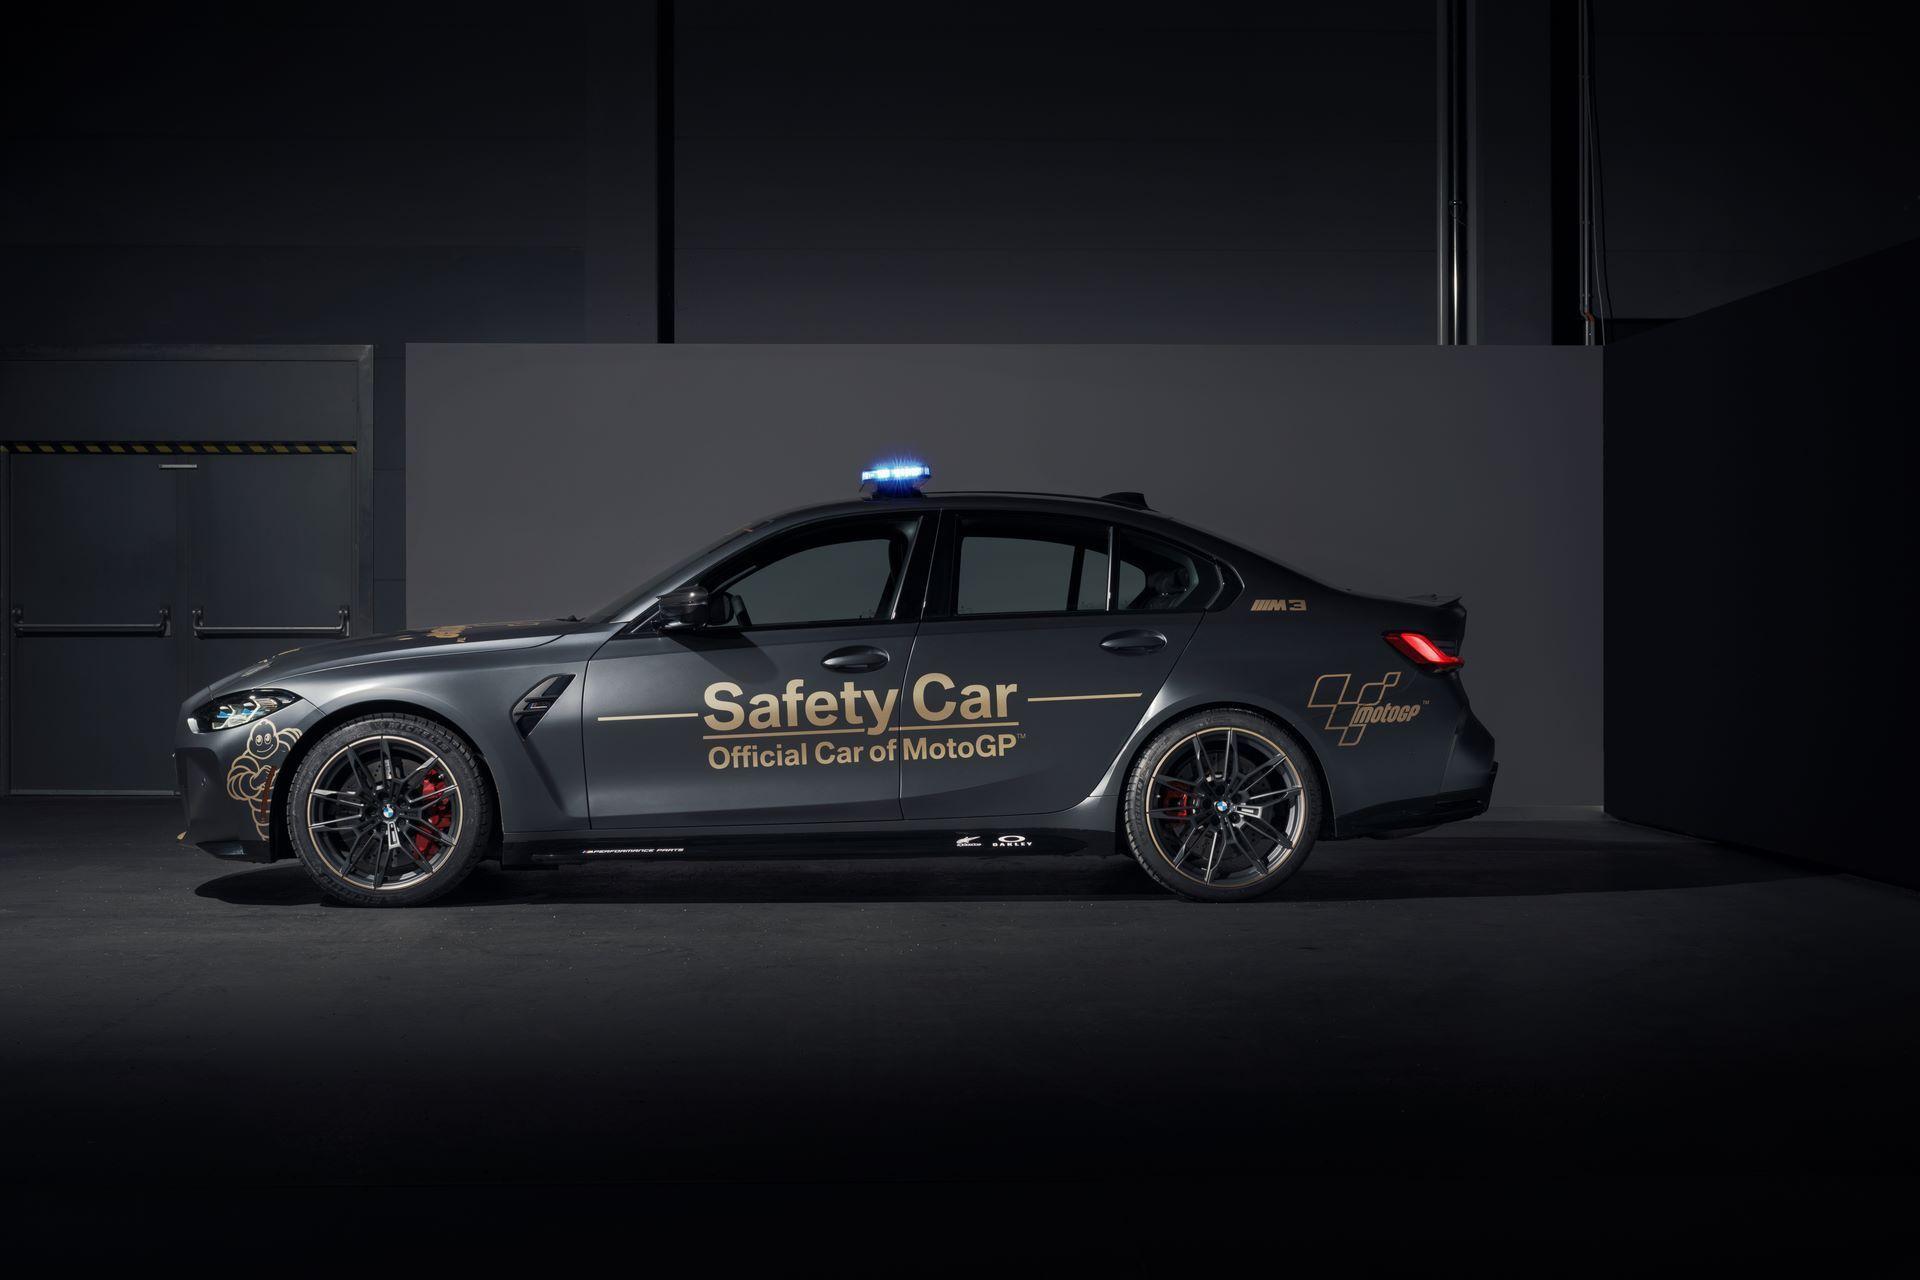 BMW-M3-M4-M5-CS-Safety-Cars-moto-gp-motogp-6